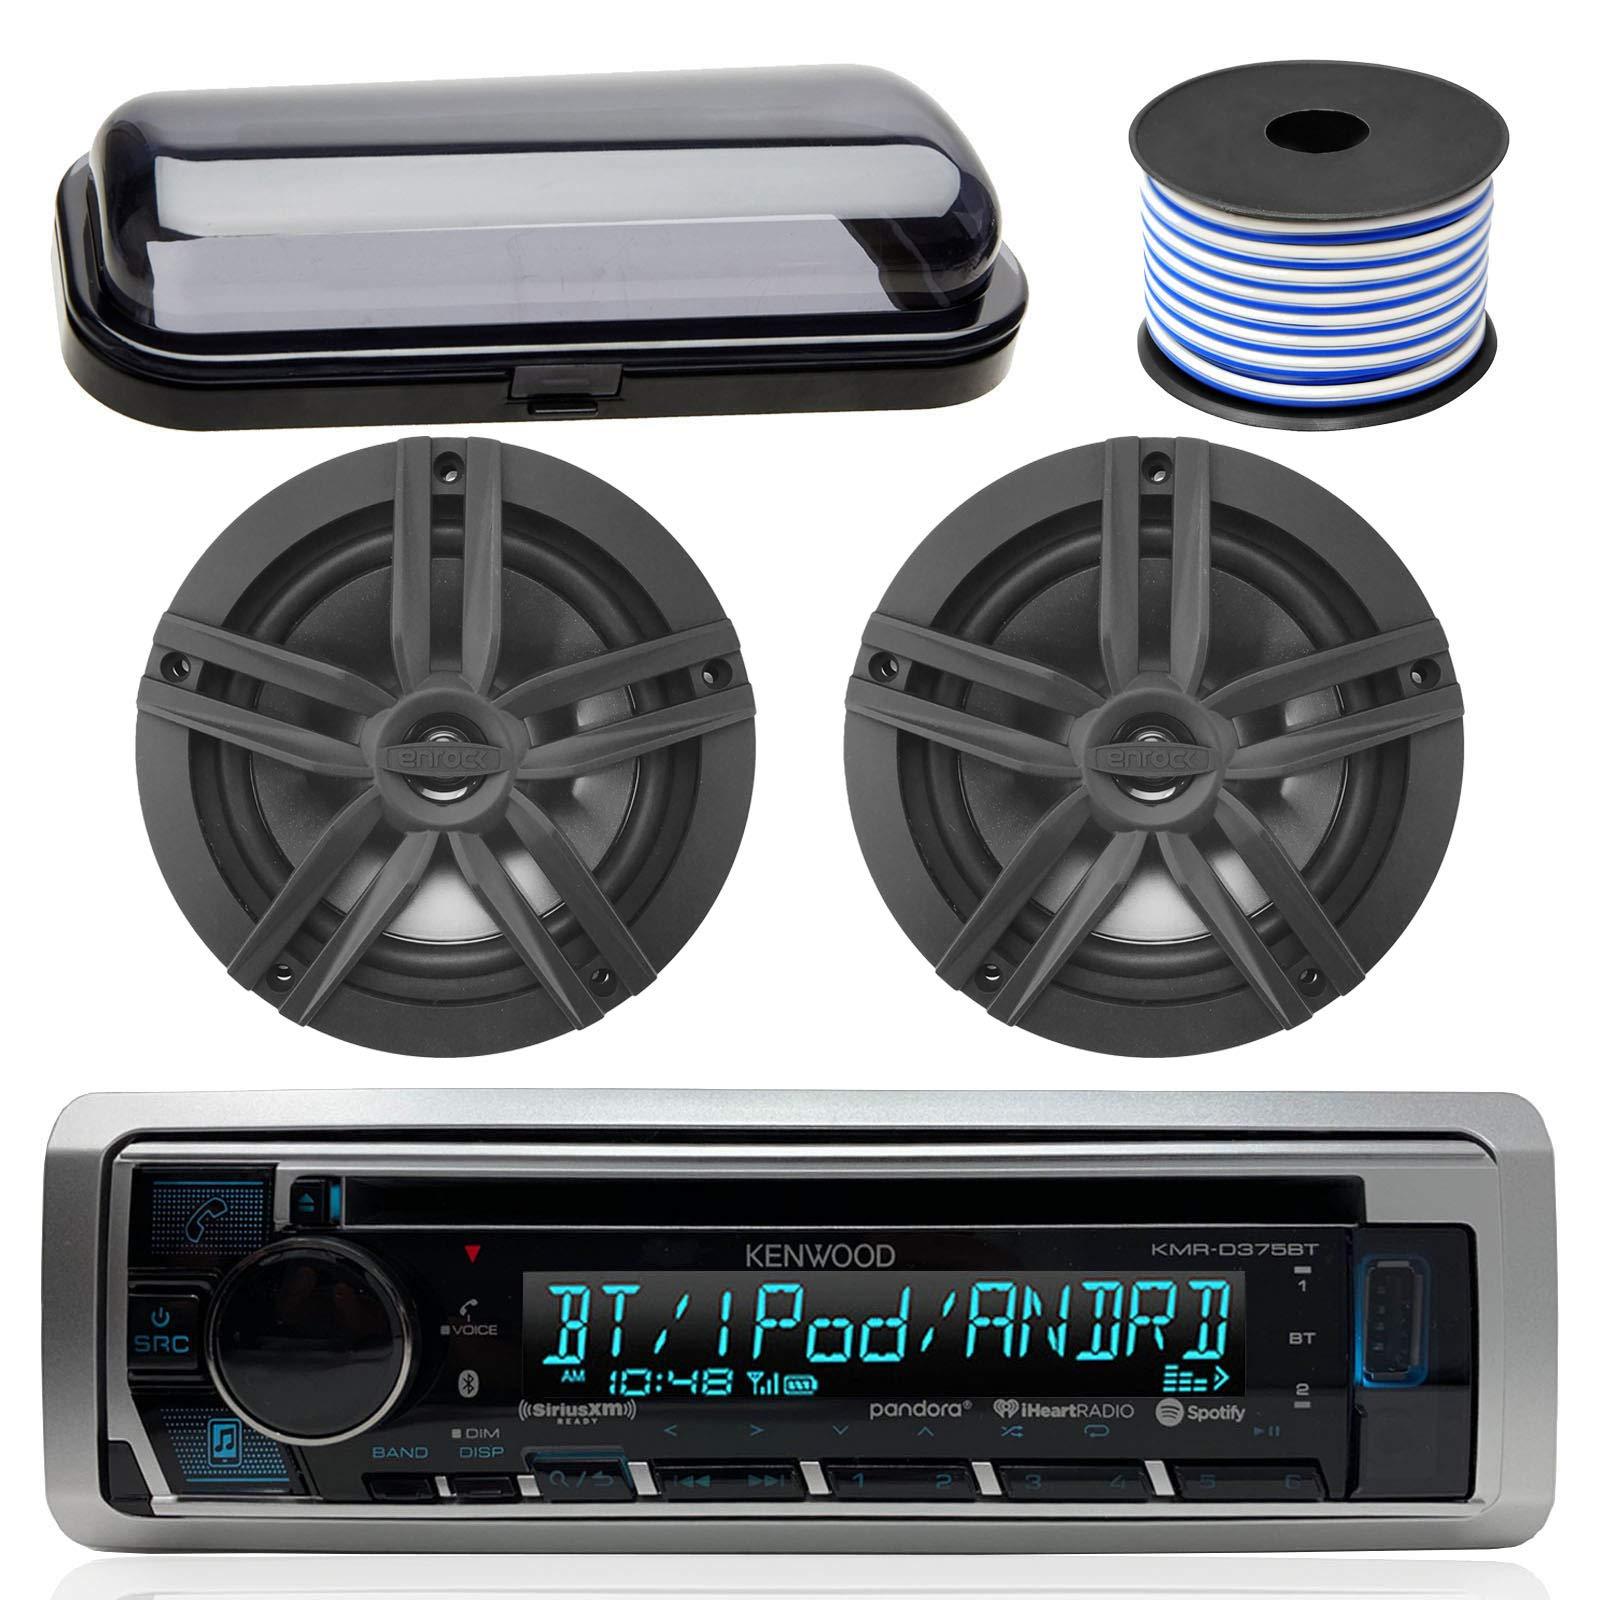 Kenwood Bluetooth CD Radio Receiver In-Dash Marine Boat Audio Bundle with Pair of Enrock 6.5'' Dual-Cone Stereo Speakers, Stereo Waterproof Cover, 18g 50ft Speaker Wire (Black / Chrome) by Enrock Kenwood Pyle